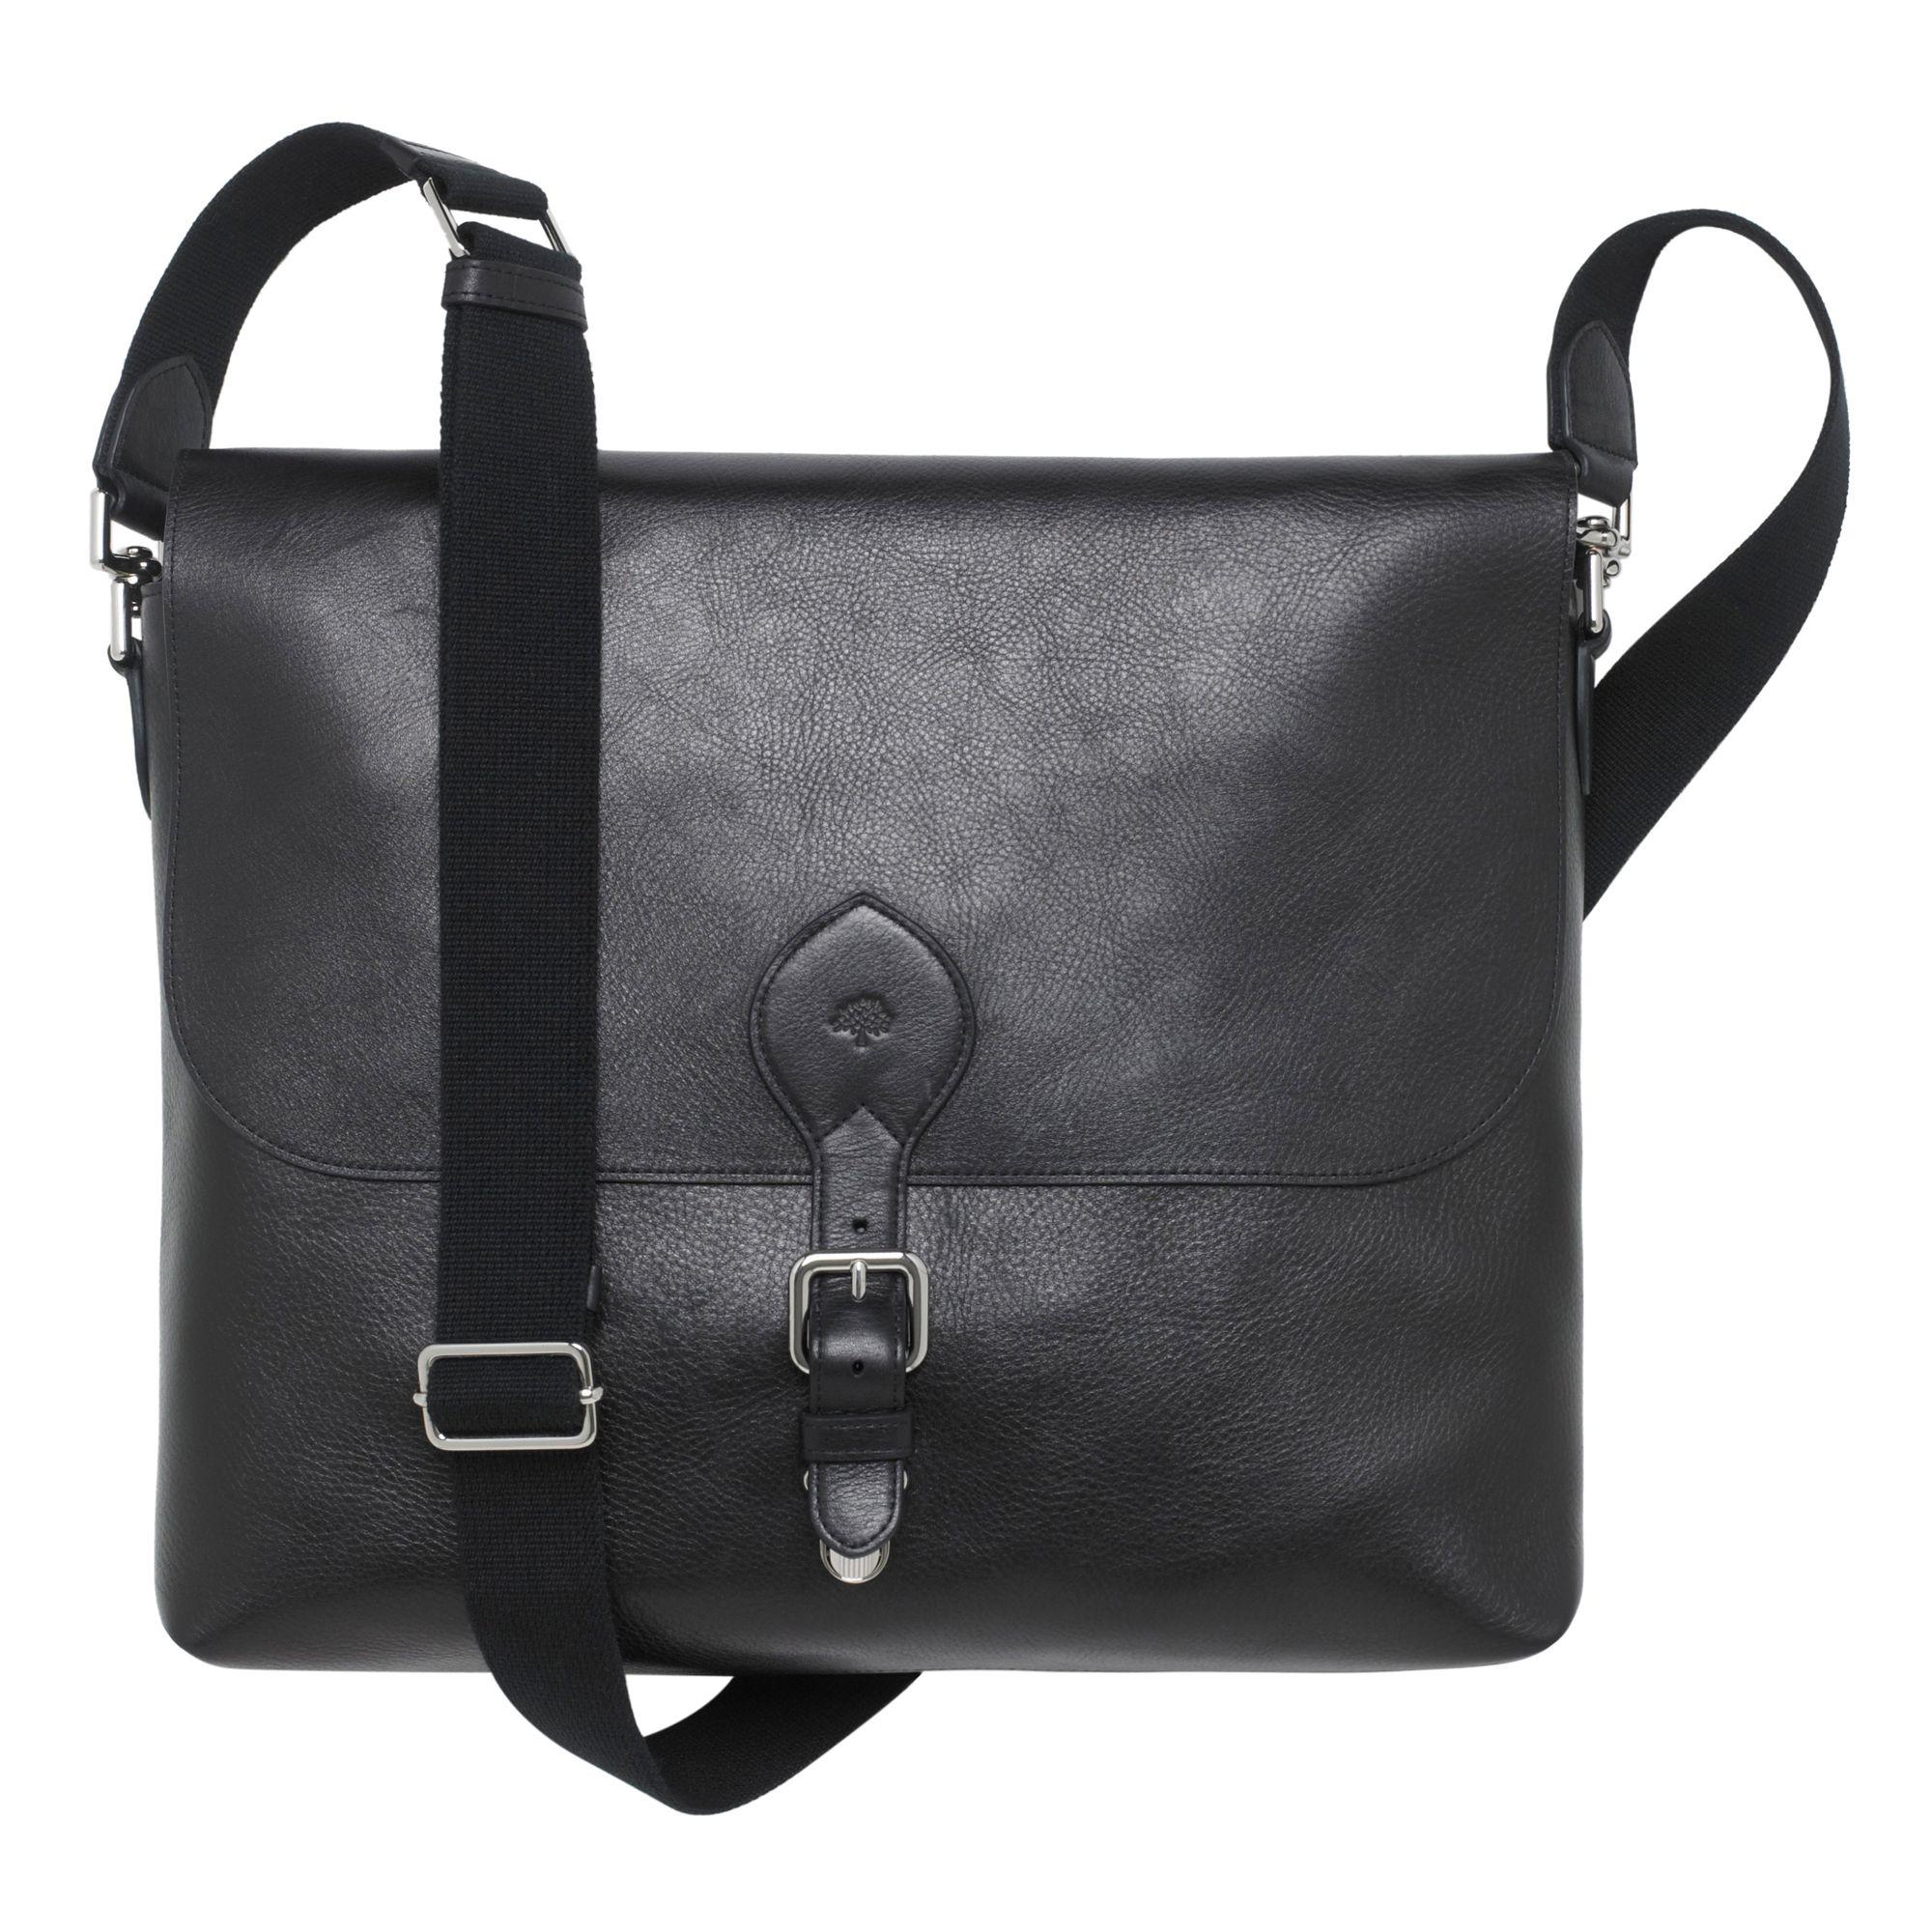 310d08981a830 Mulberry Albert Satchel in Black for Men - Lyst